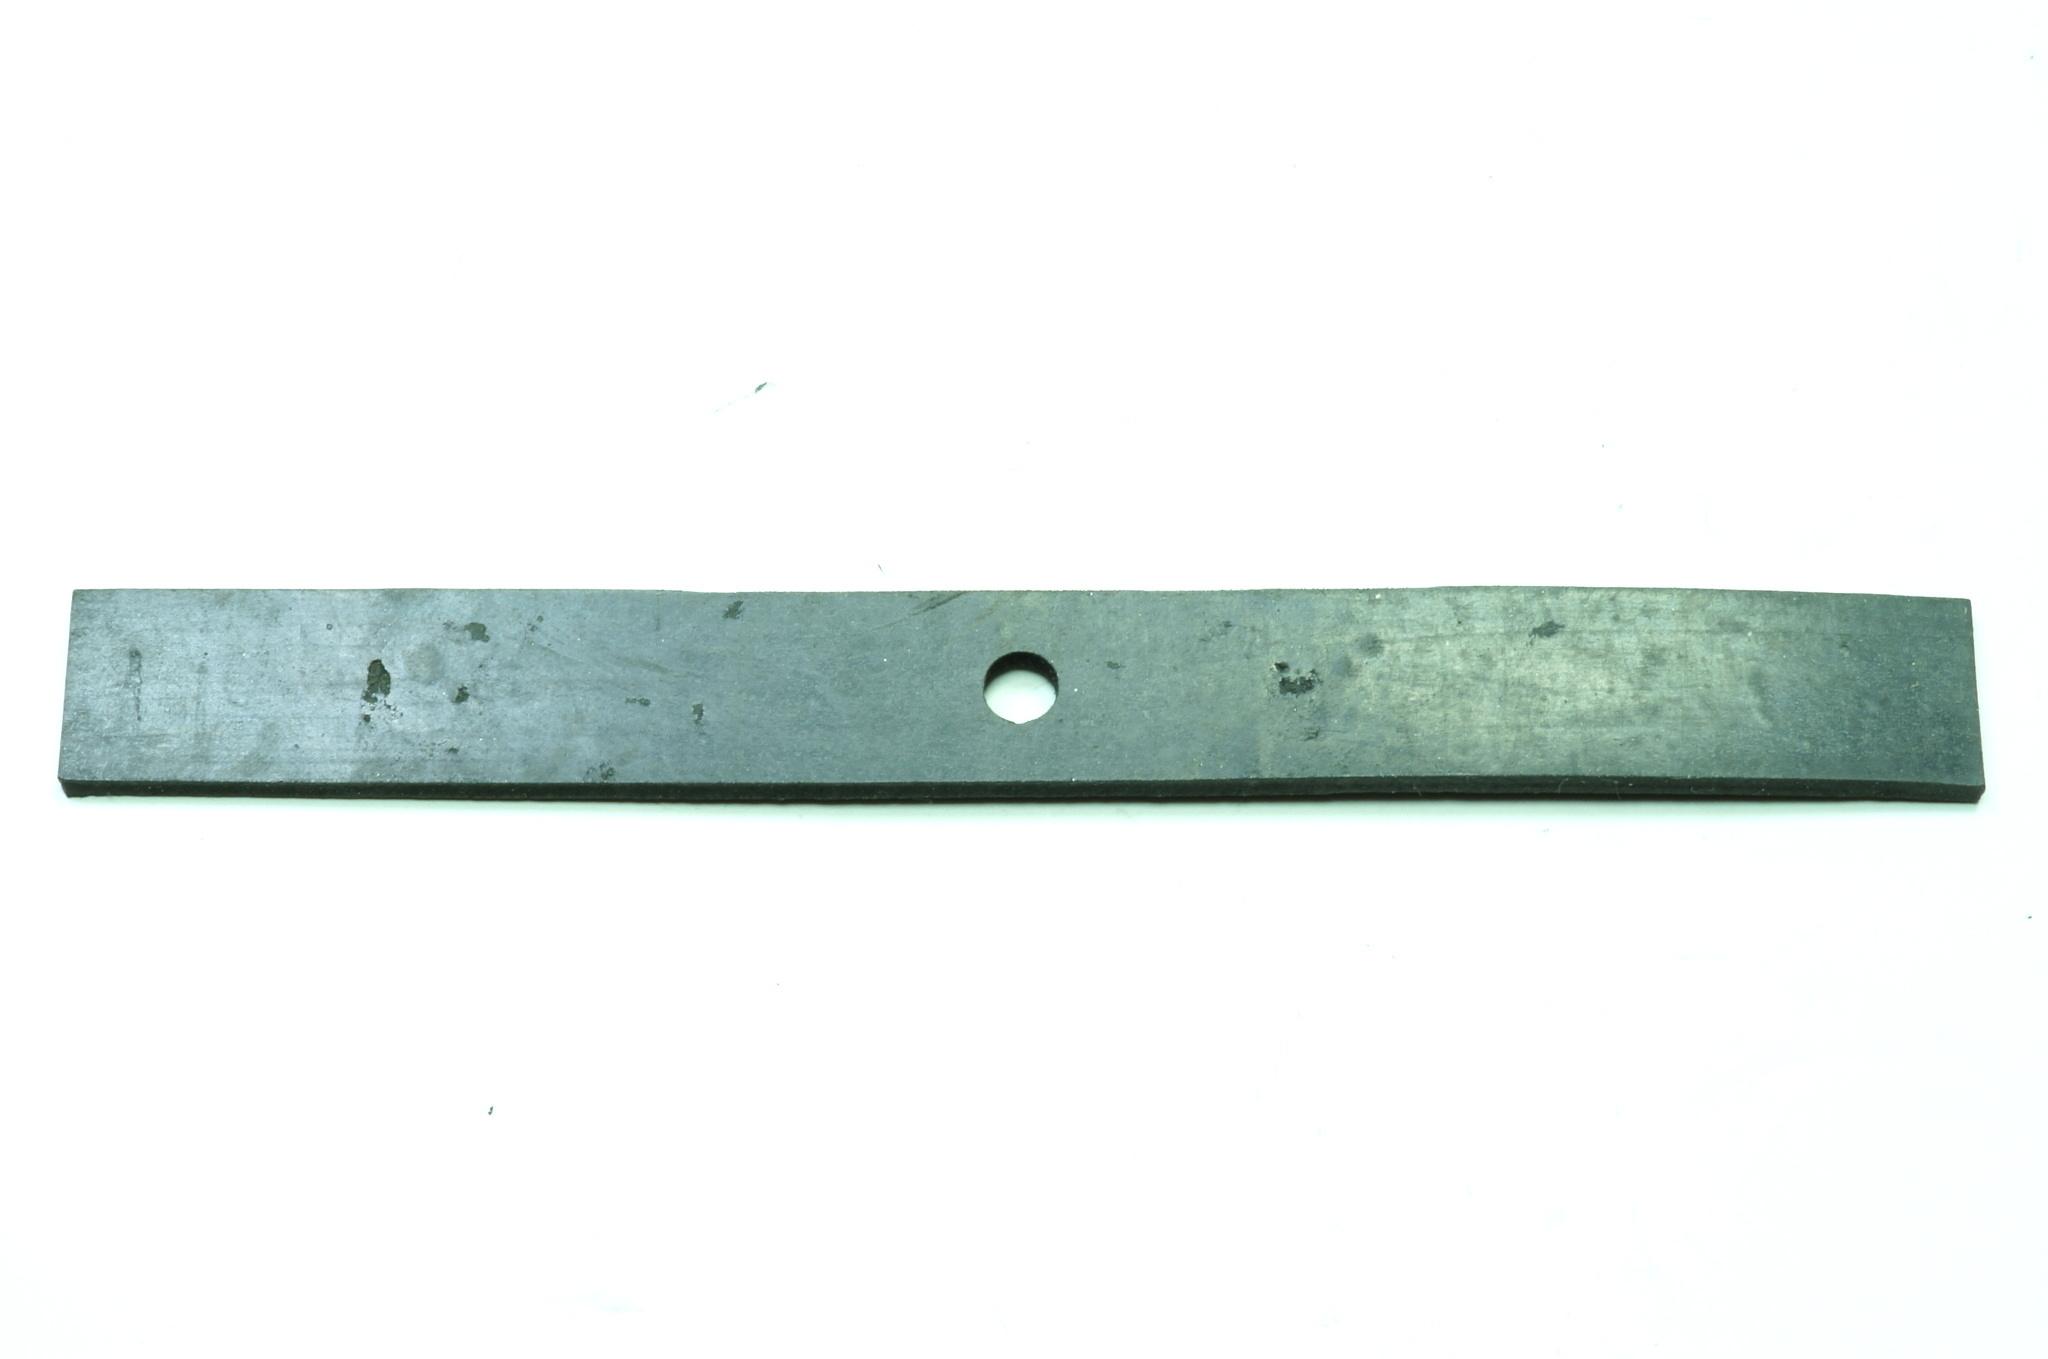 Прокладка стёкол заднего фонаря Москвич 407, 403